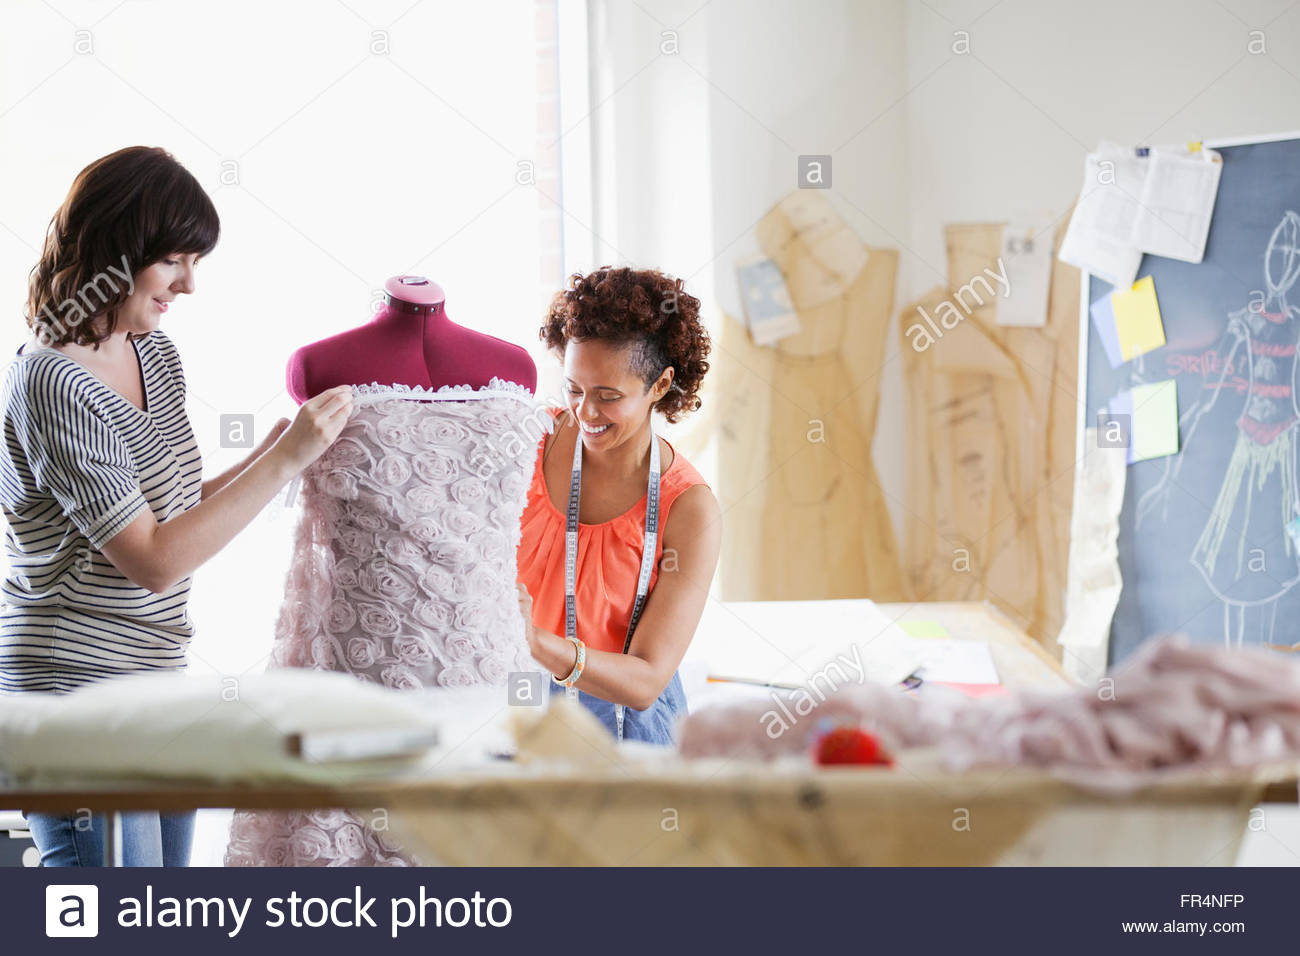 dress designers working together on dress form - Stock Image